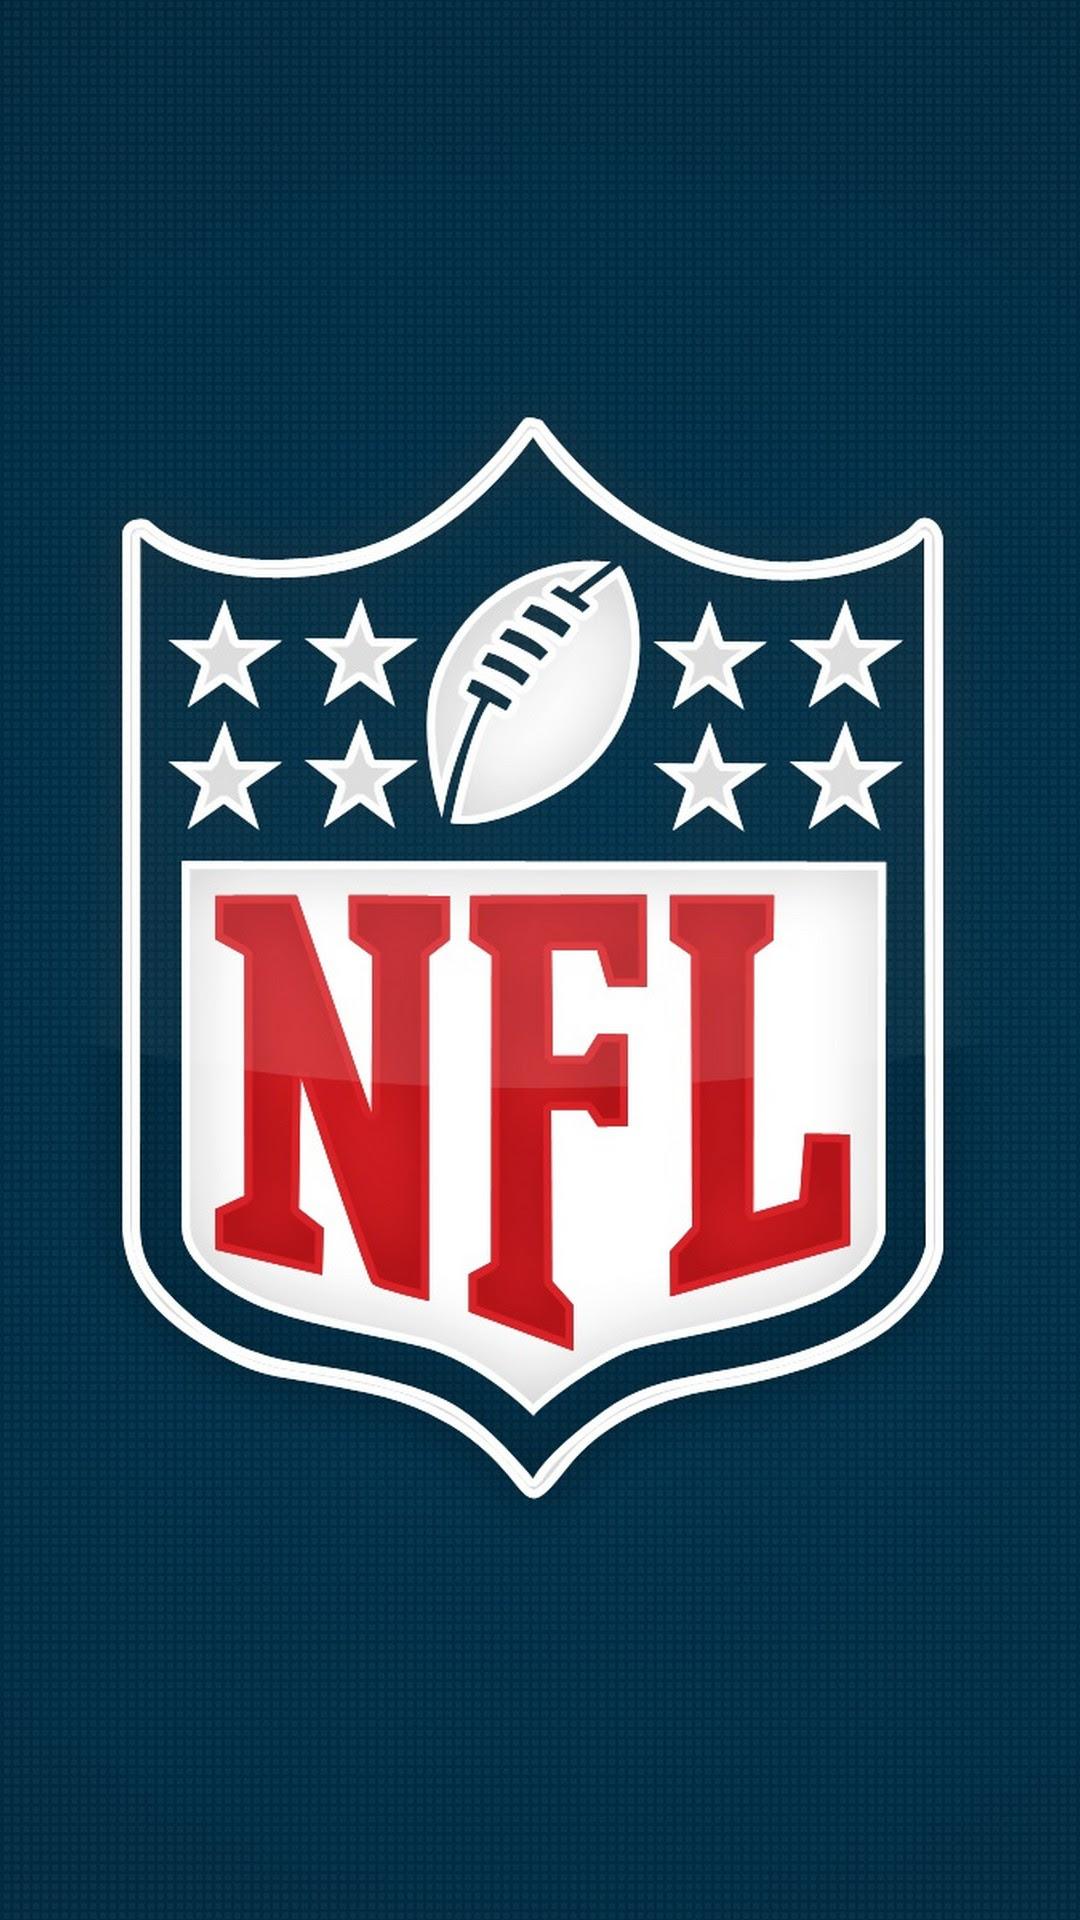 Cool NFL Wallpaper iPhone HD | 2019 NFL Football Wallpapers